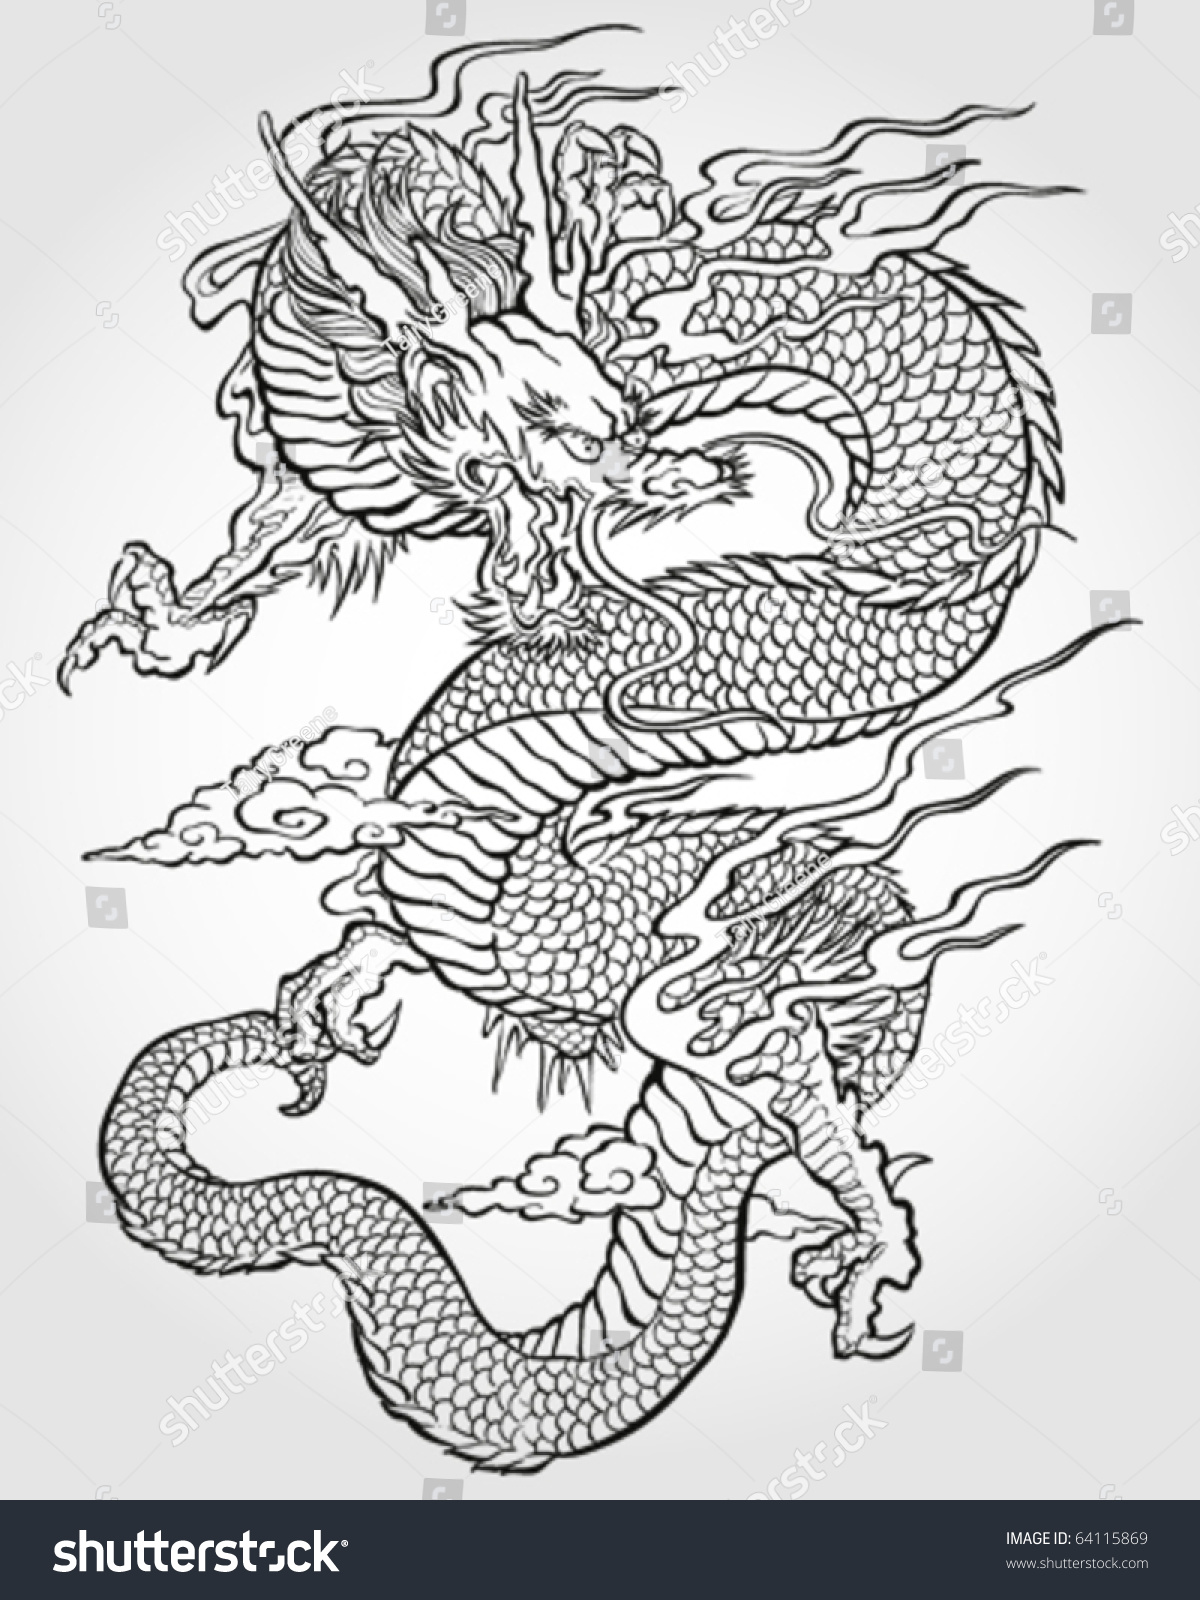 Tradition Asian Dragon Illustration Stock Vector